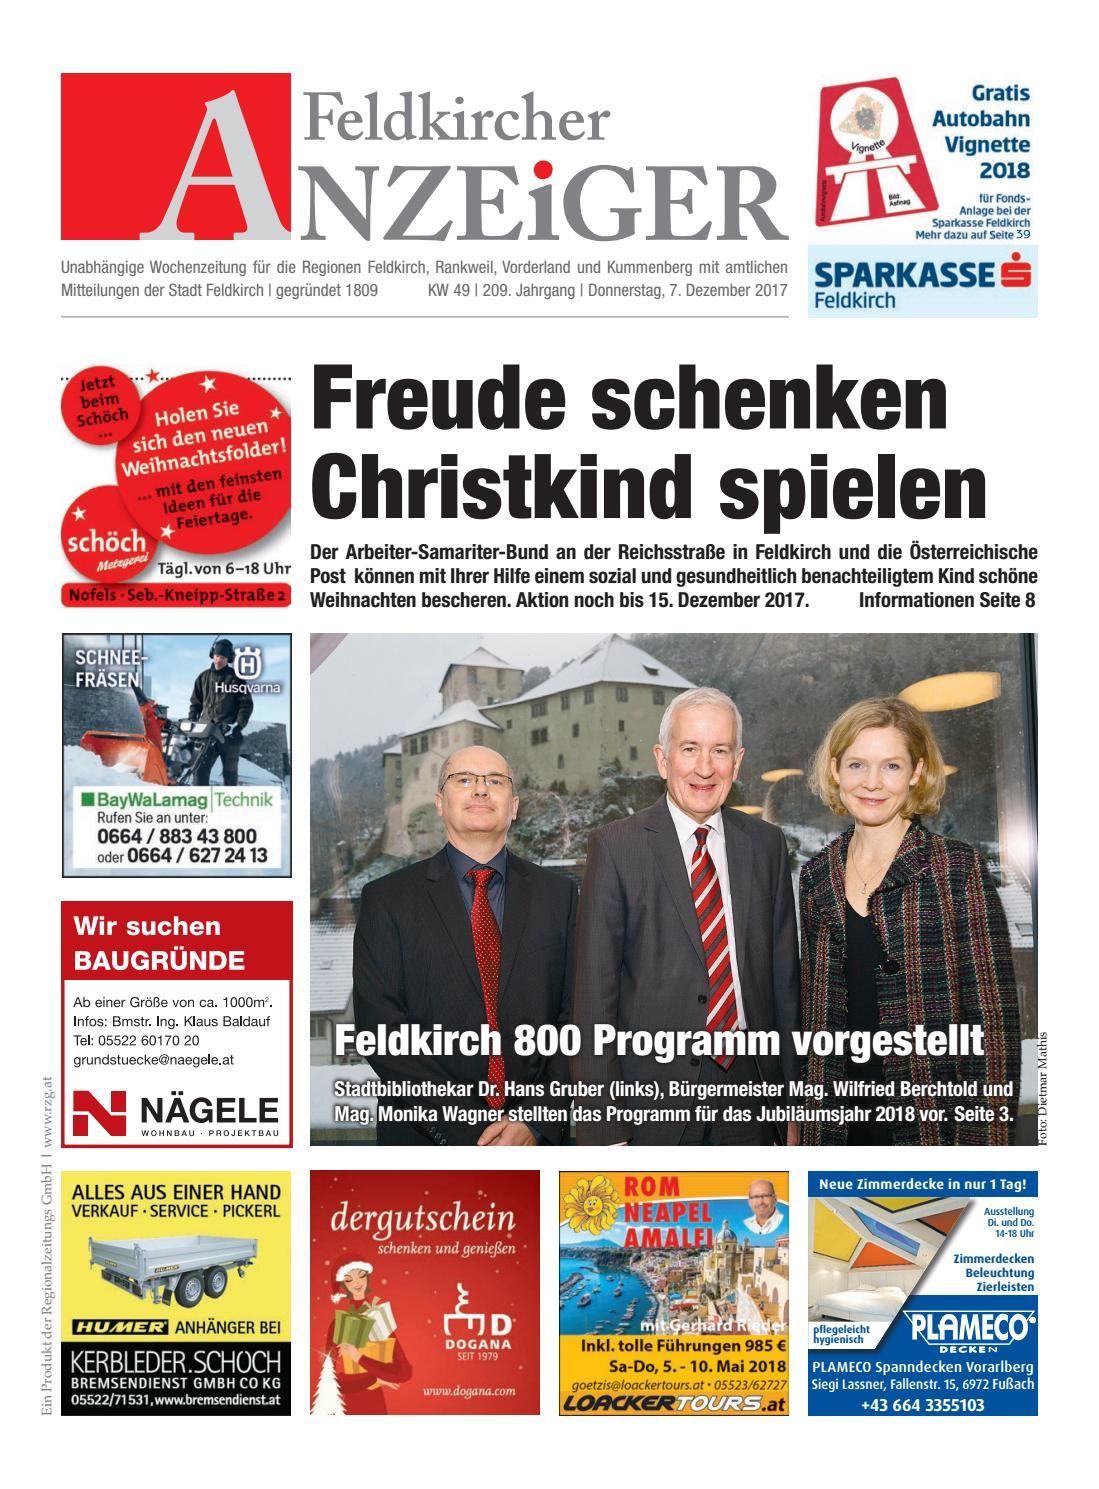 Av Aktiv in Feldkirch - Bekanntschaften - Partnersuche